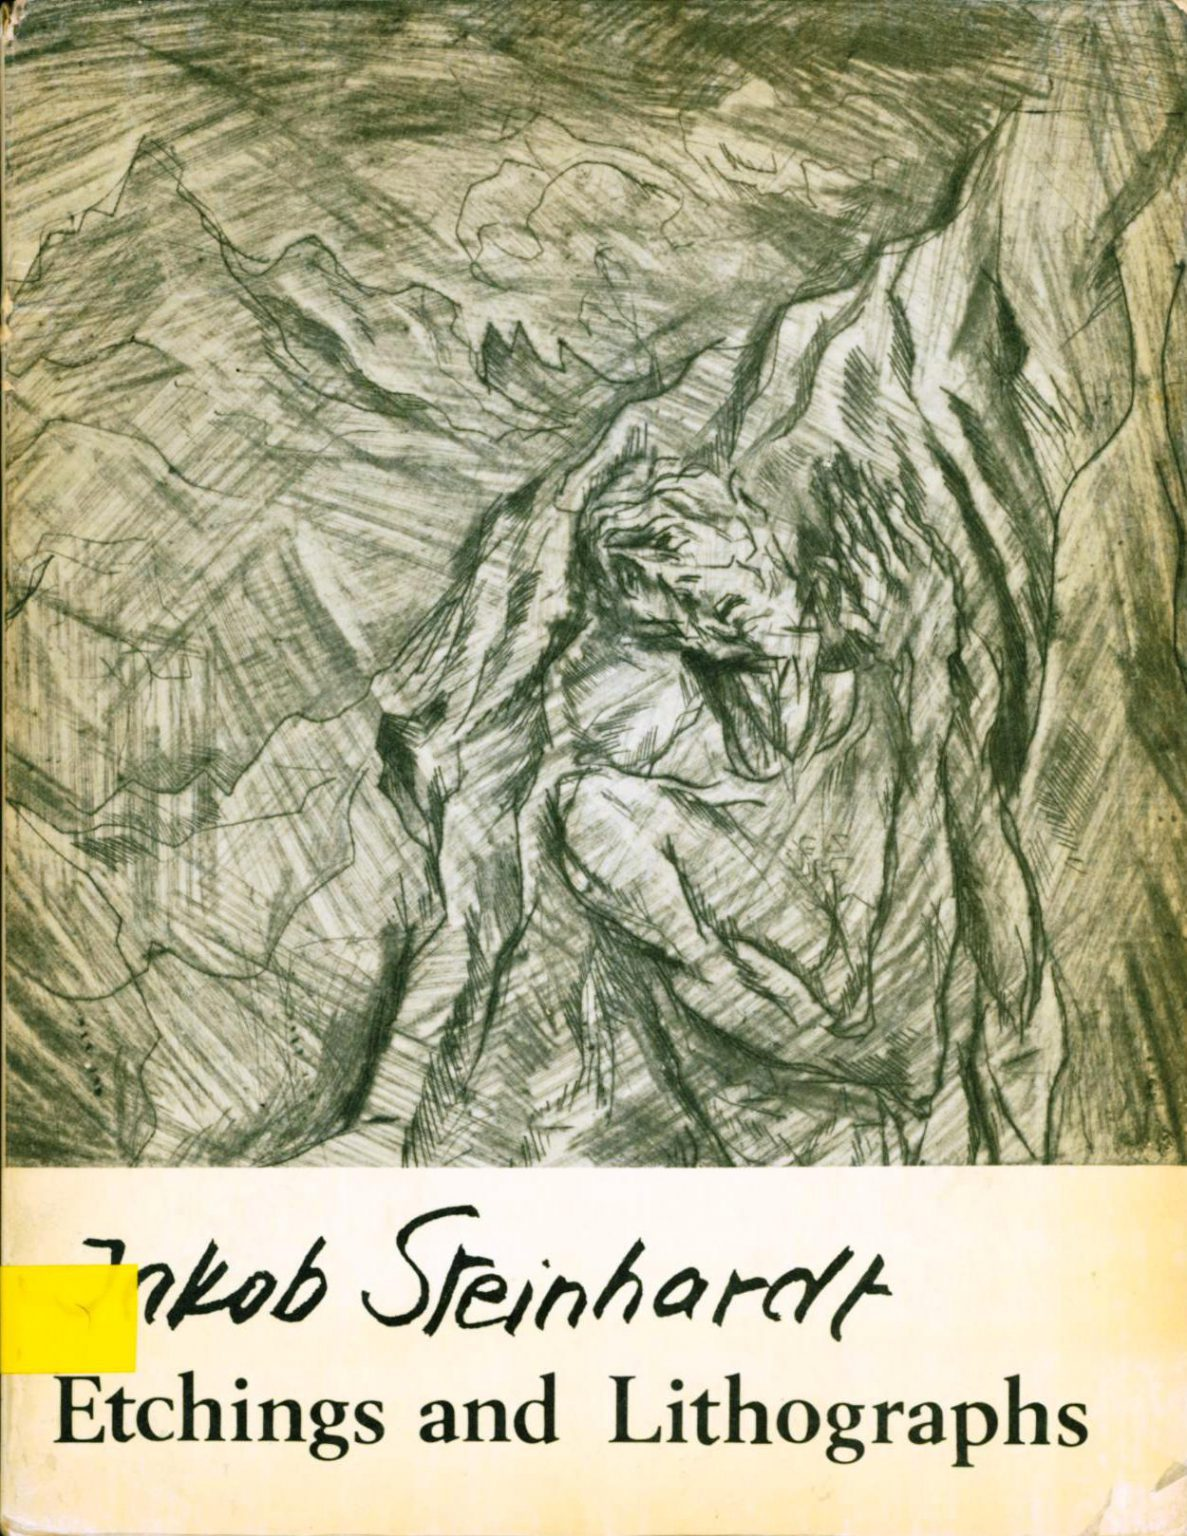 Ziva Amishai-Maisels, Jacob Steinhardt: Etching and Lithographs, Dvir, Jerusalem, 1981